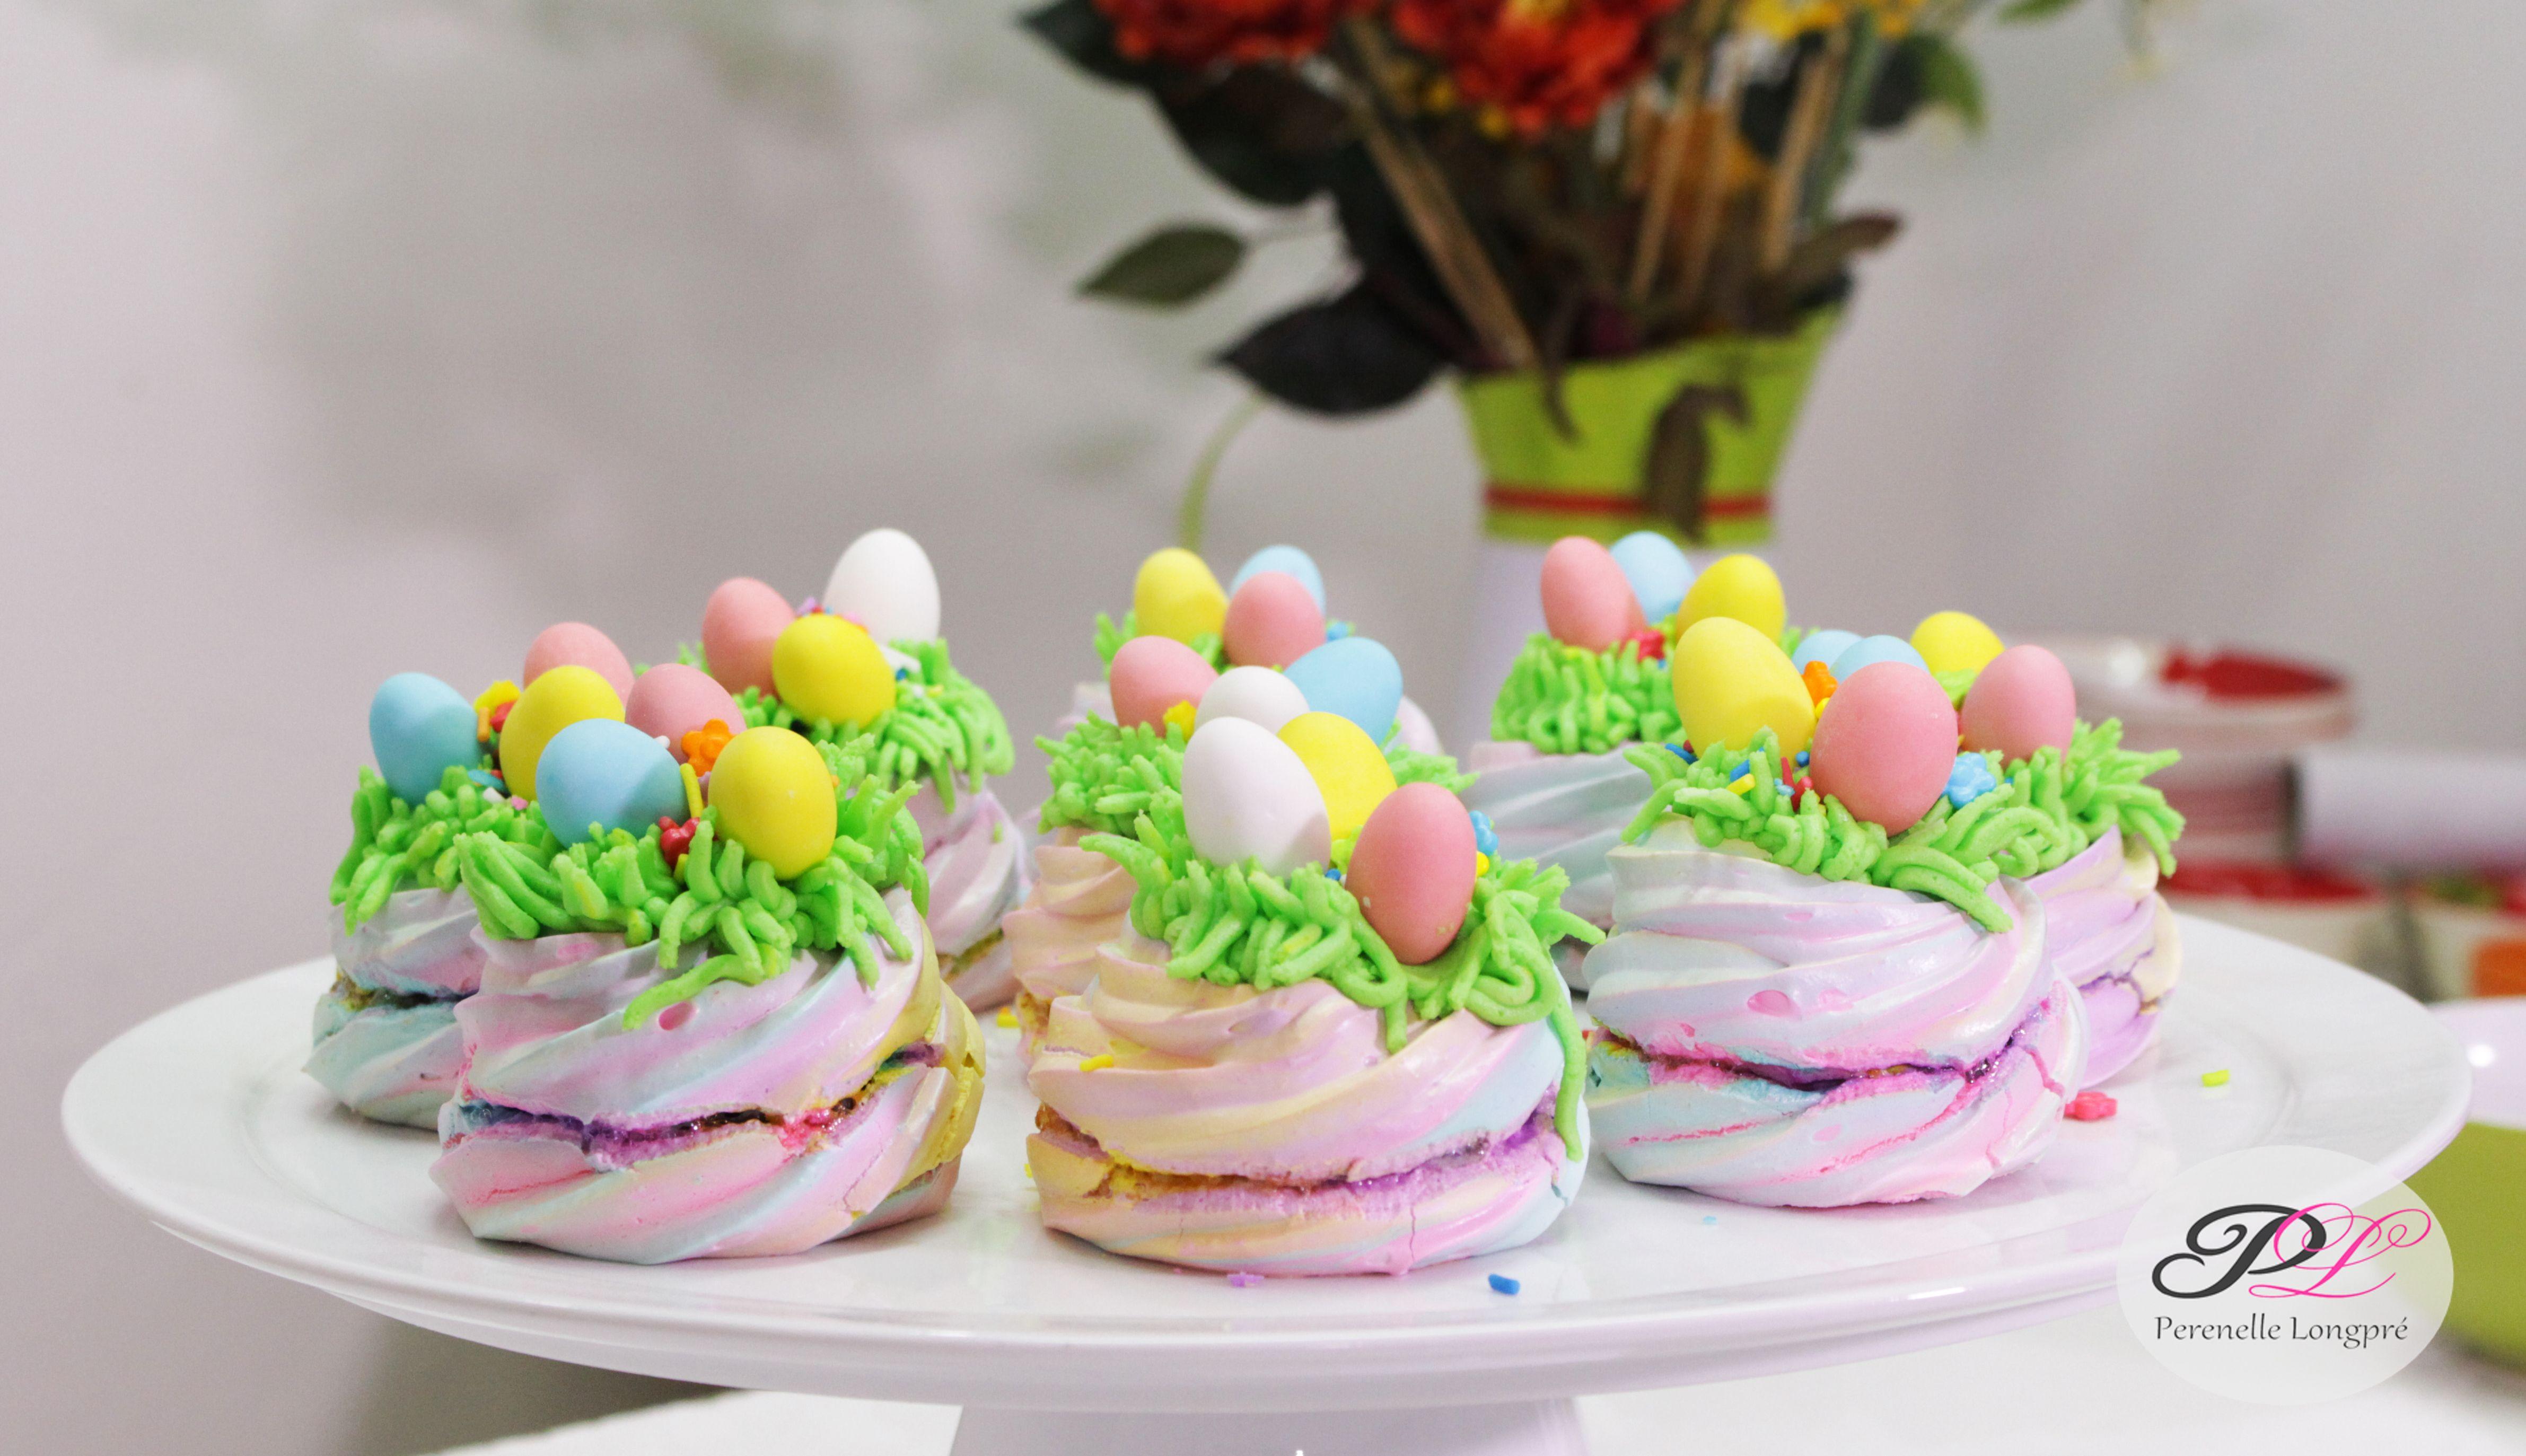 Decorar con buttercream, sprinkles y huevitos de pascua